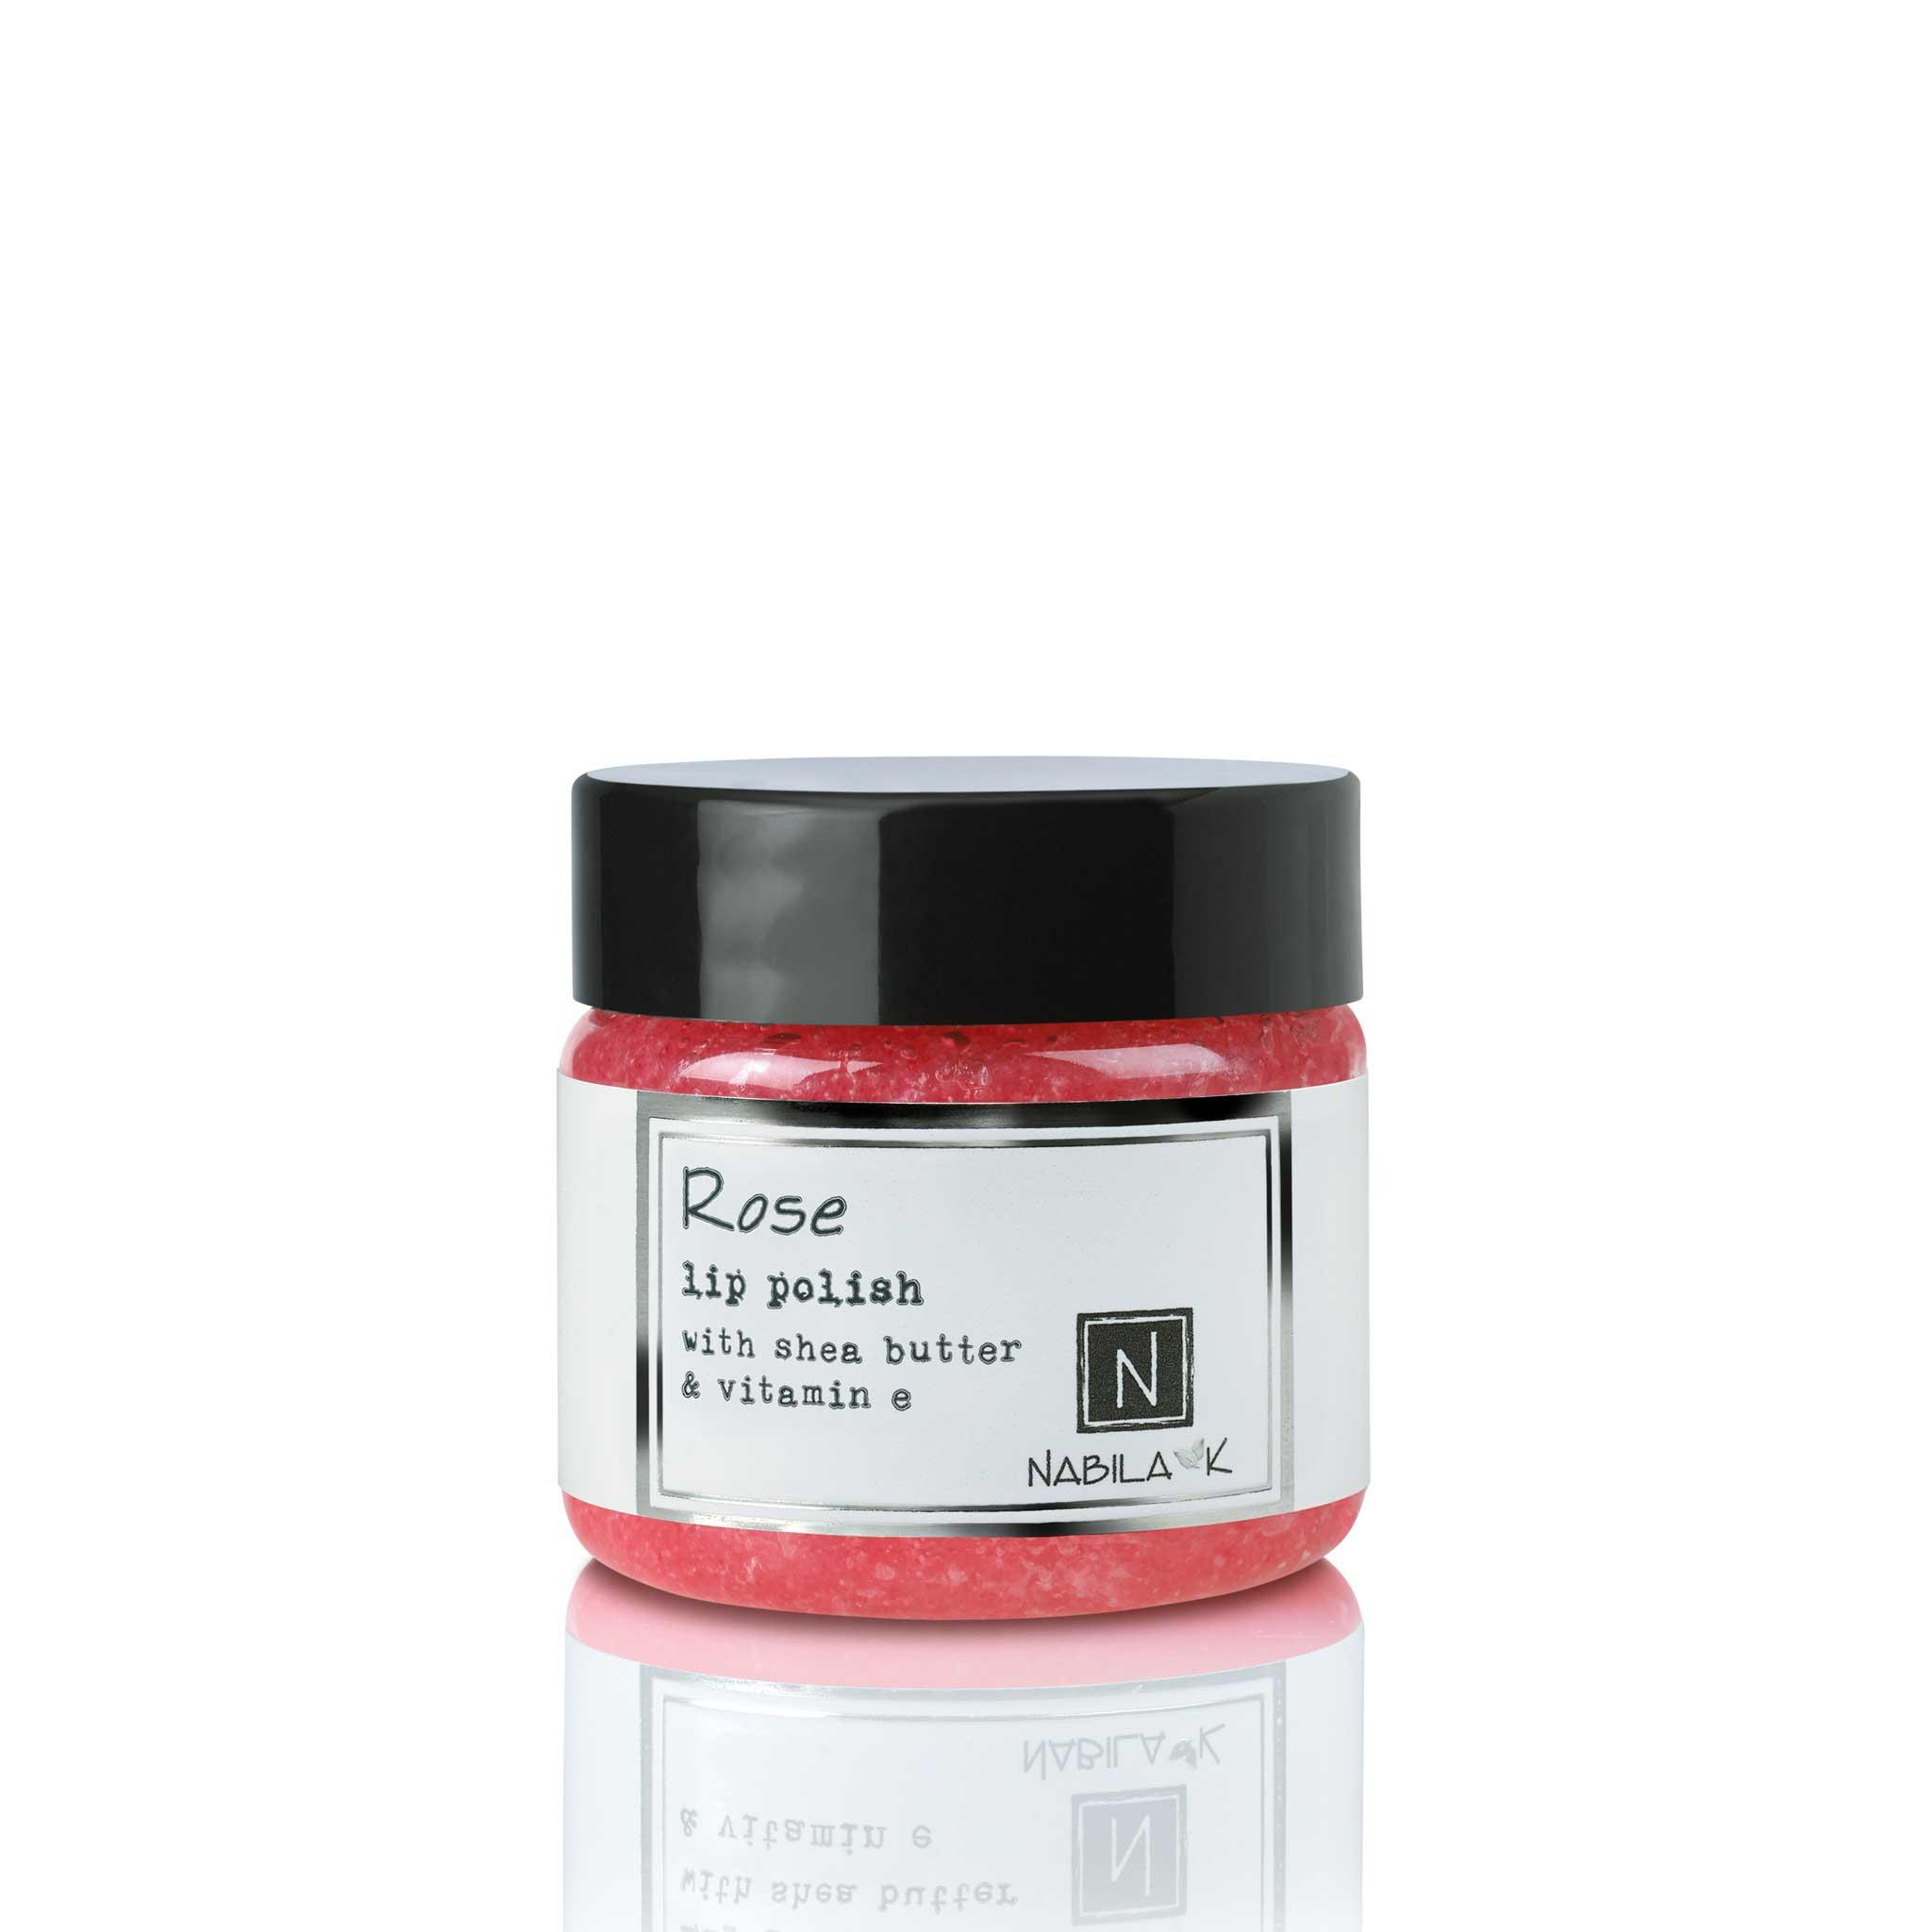 1 Jar of Nabila K's Rose Lip Polish with Shea Butter and Vitamin E